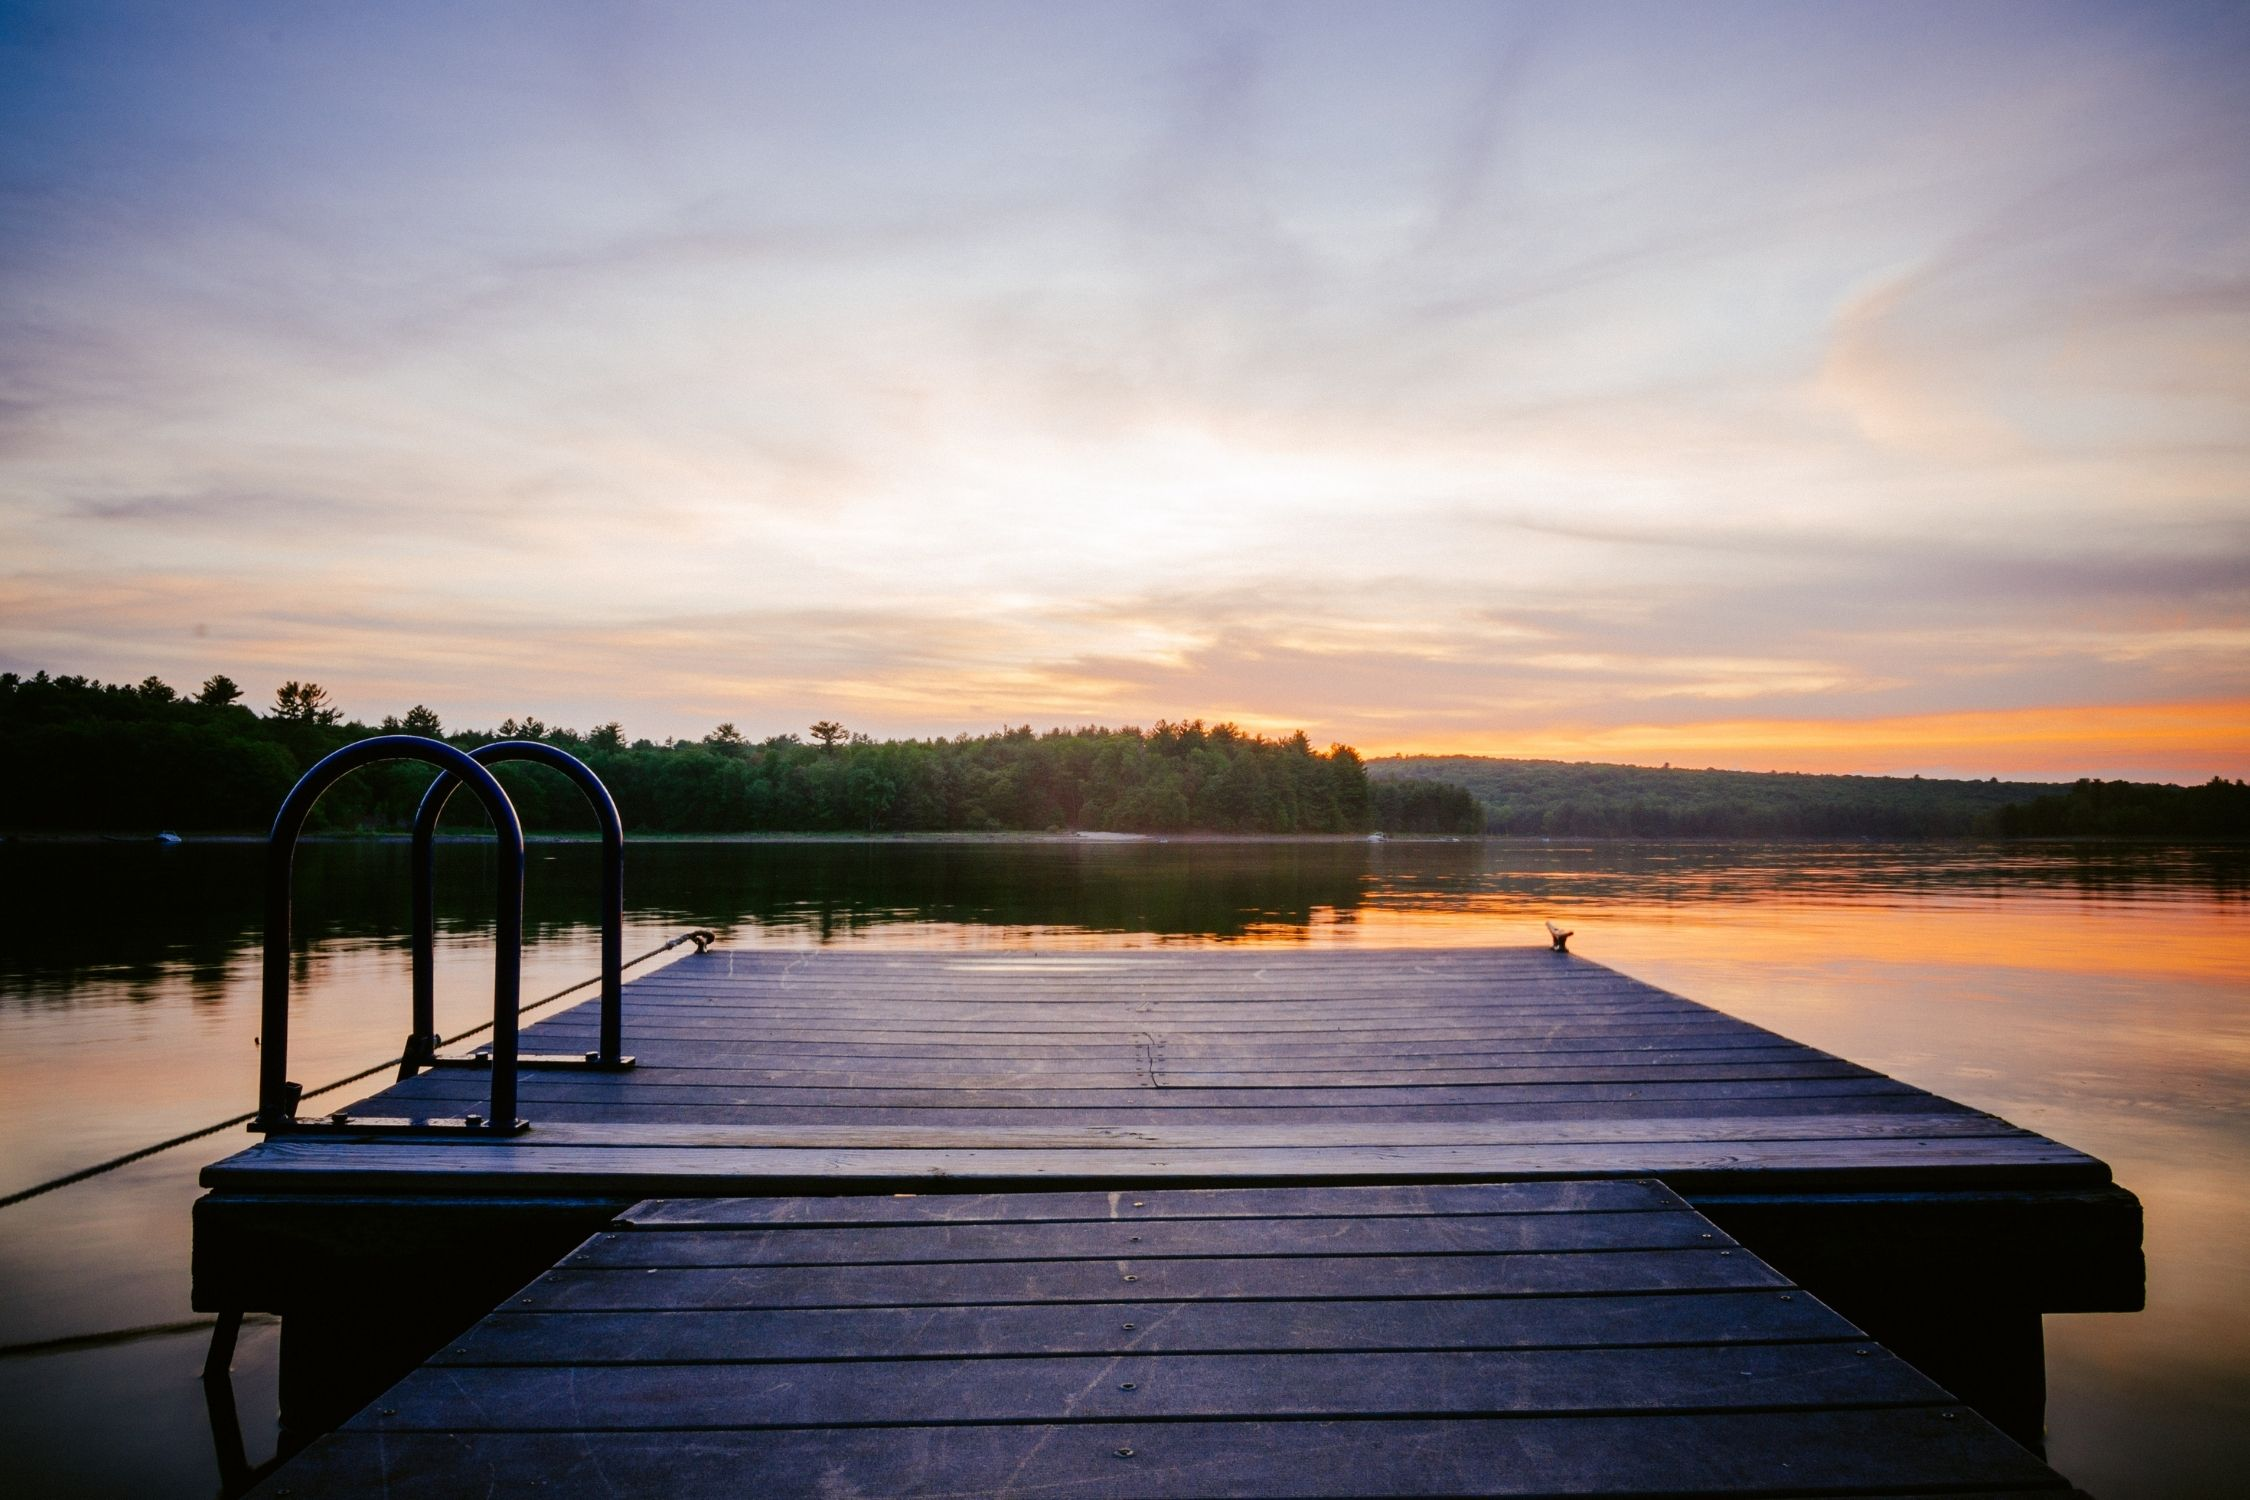 Monticello Reservoir